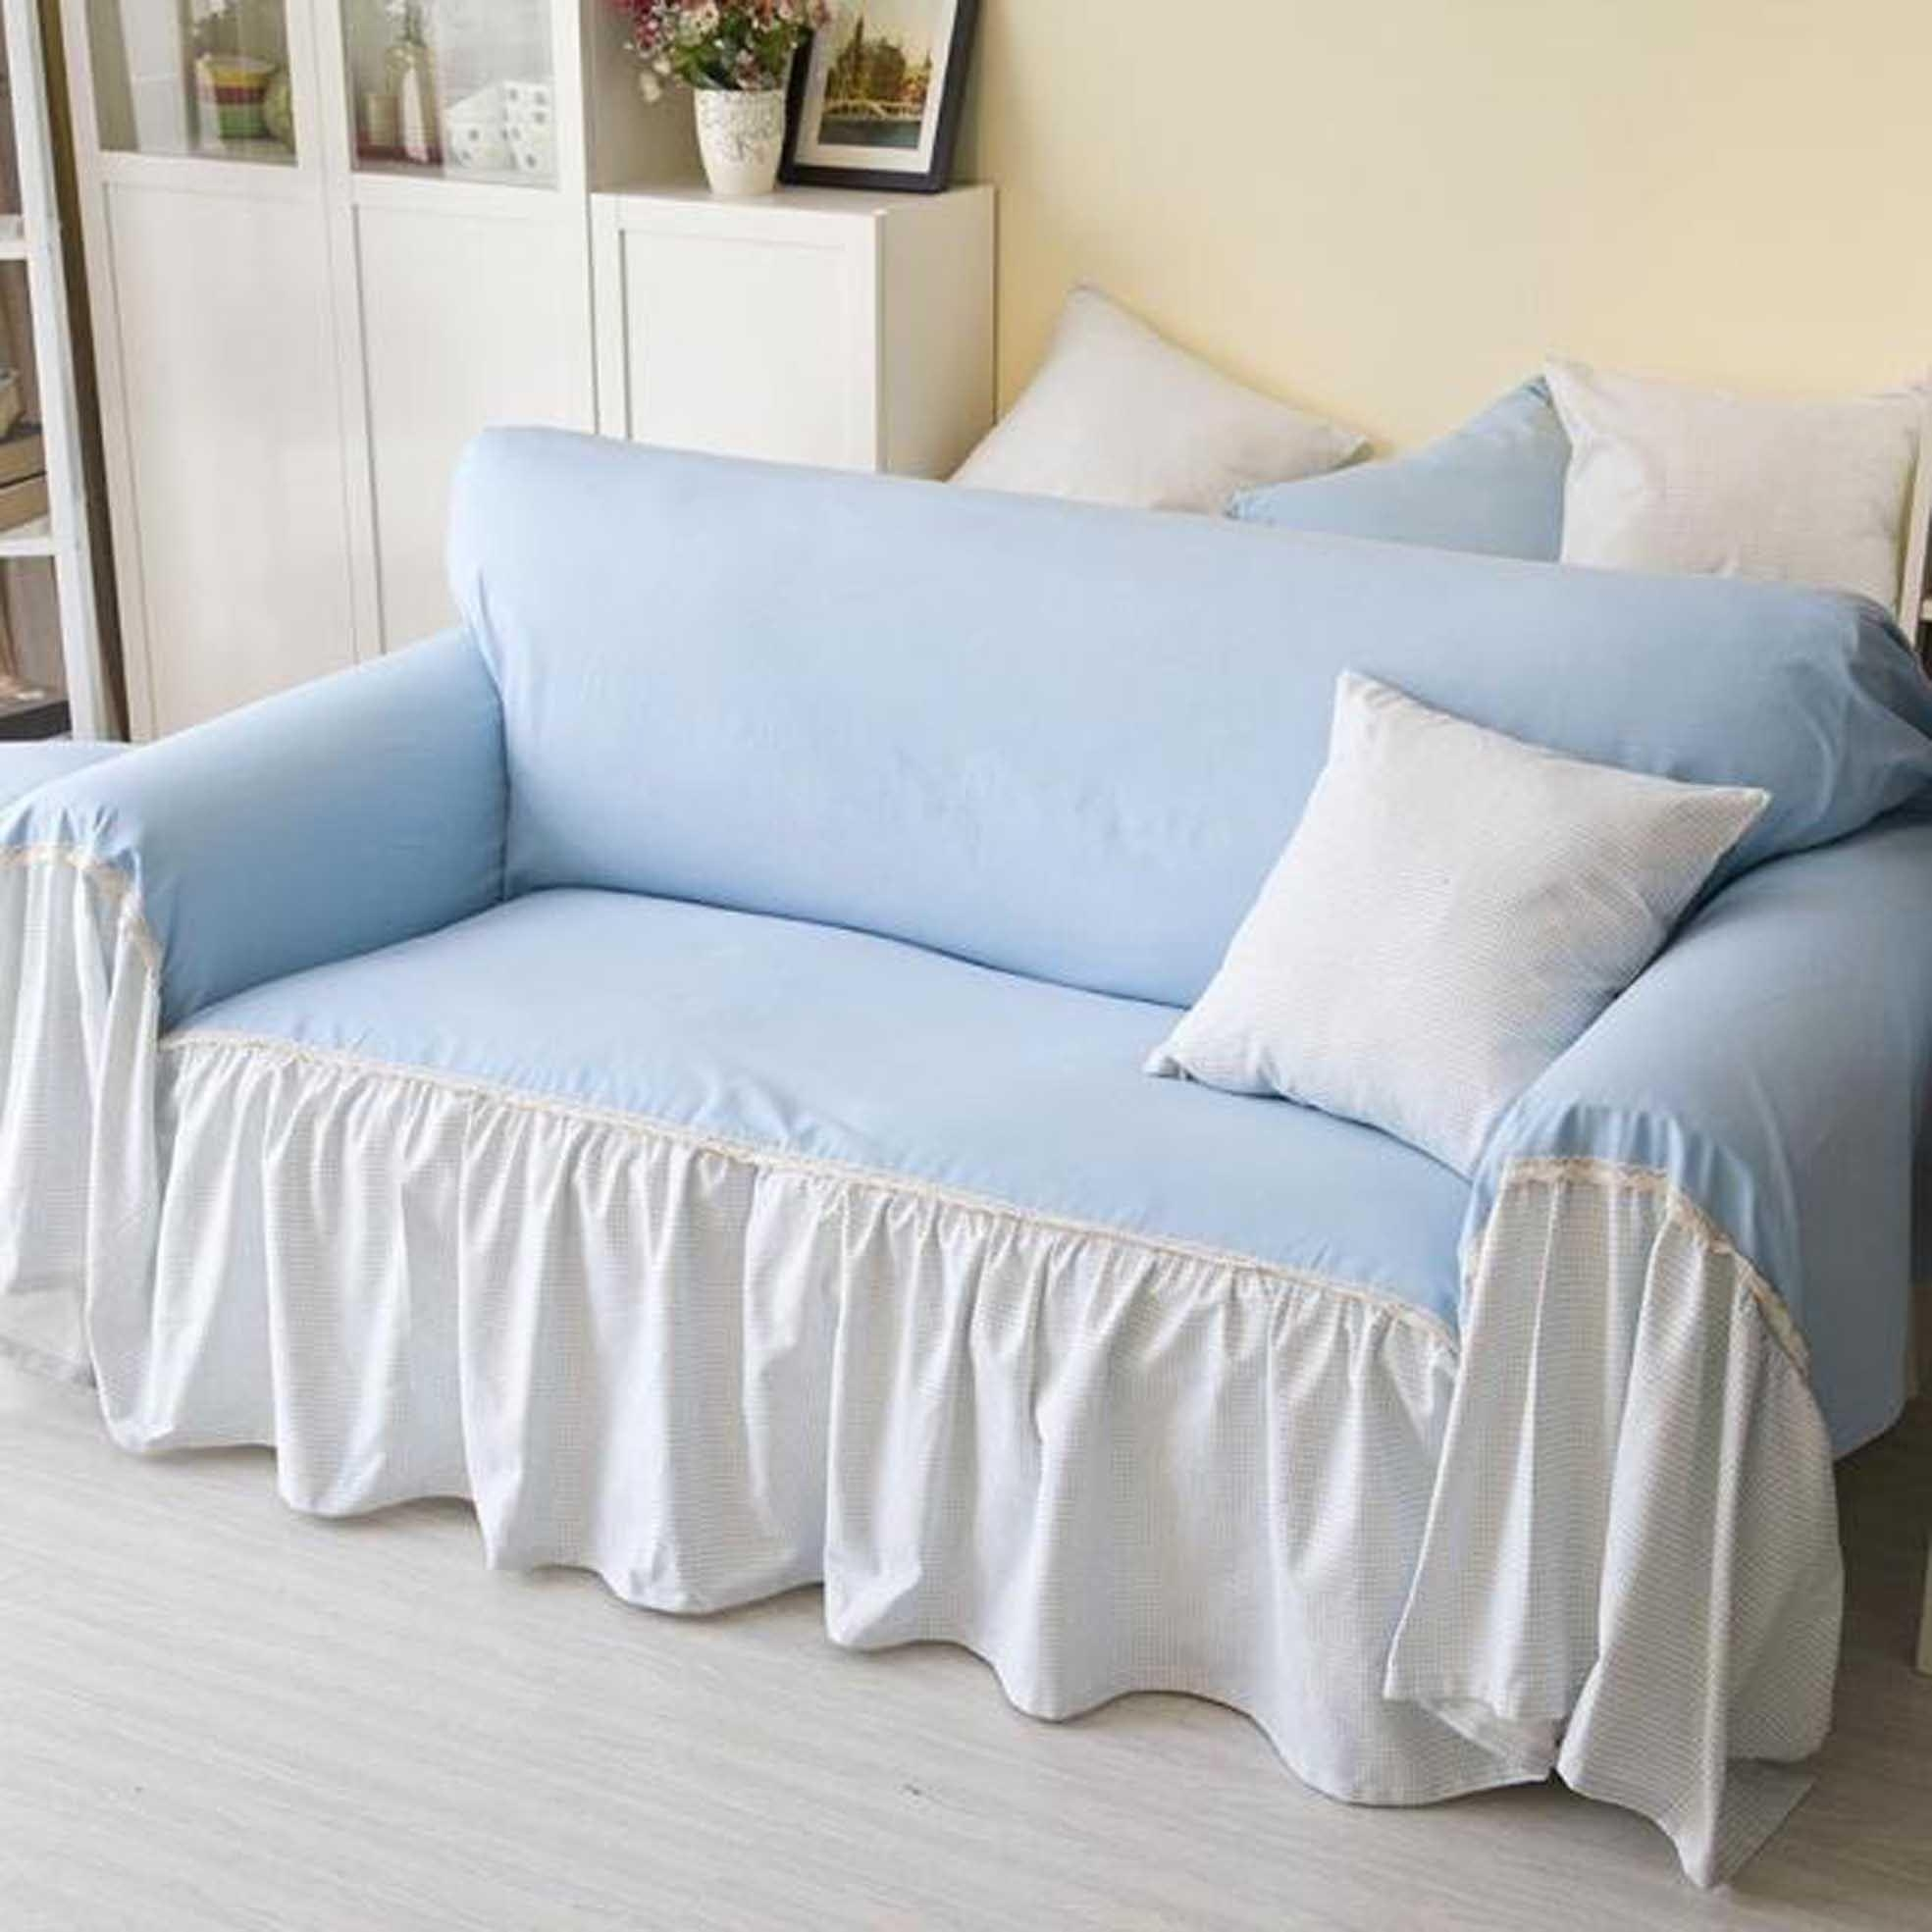 Furniture: 2 Piece Sofa Slipcover | Shabby Chic Sofa Slipcovers For Shabby Chic Sofa Slipcovers (View 6 of 20)